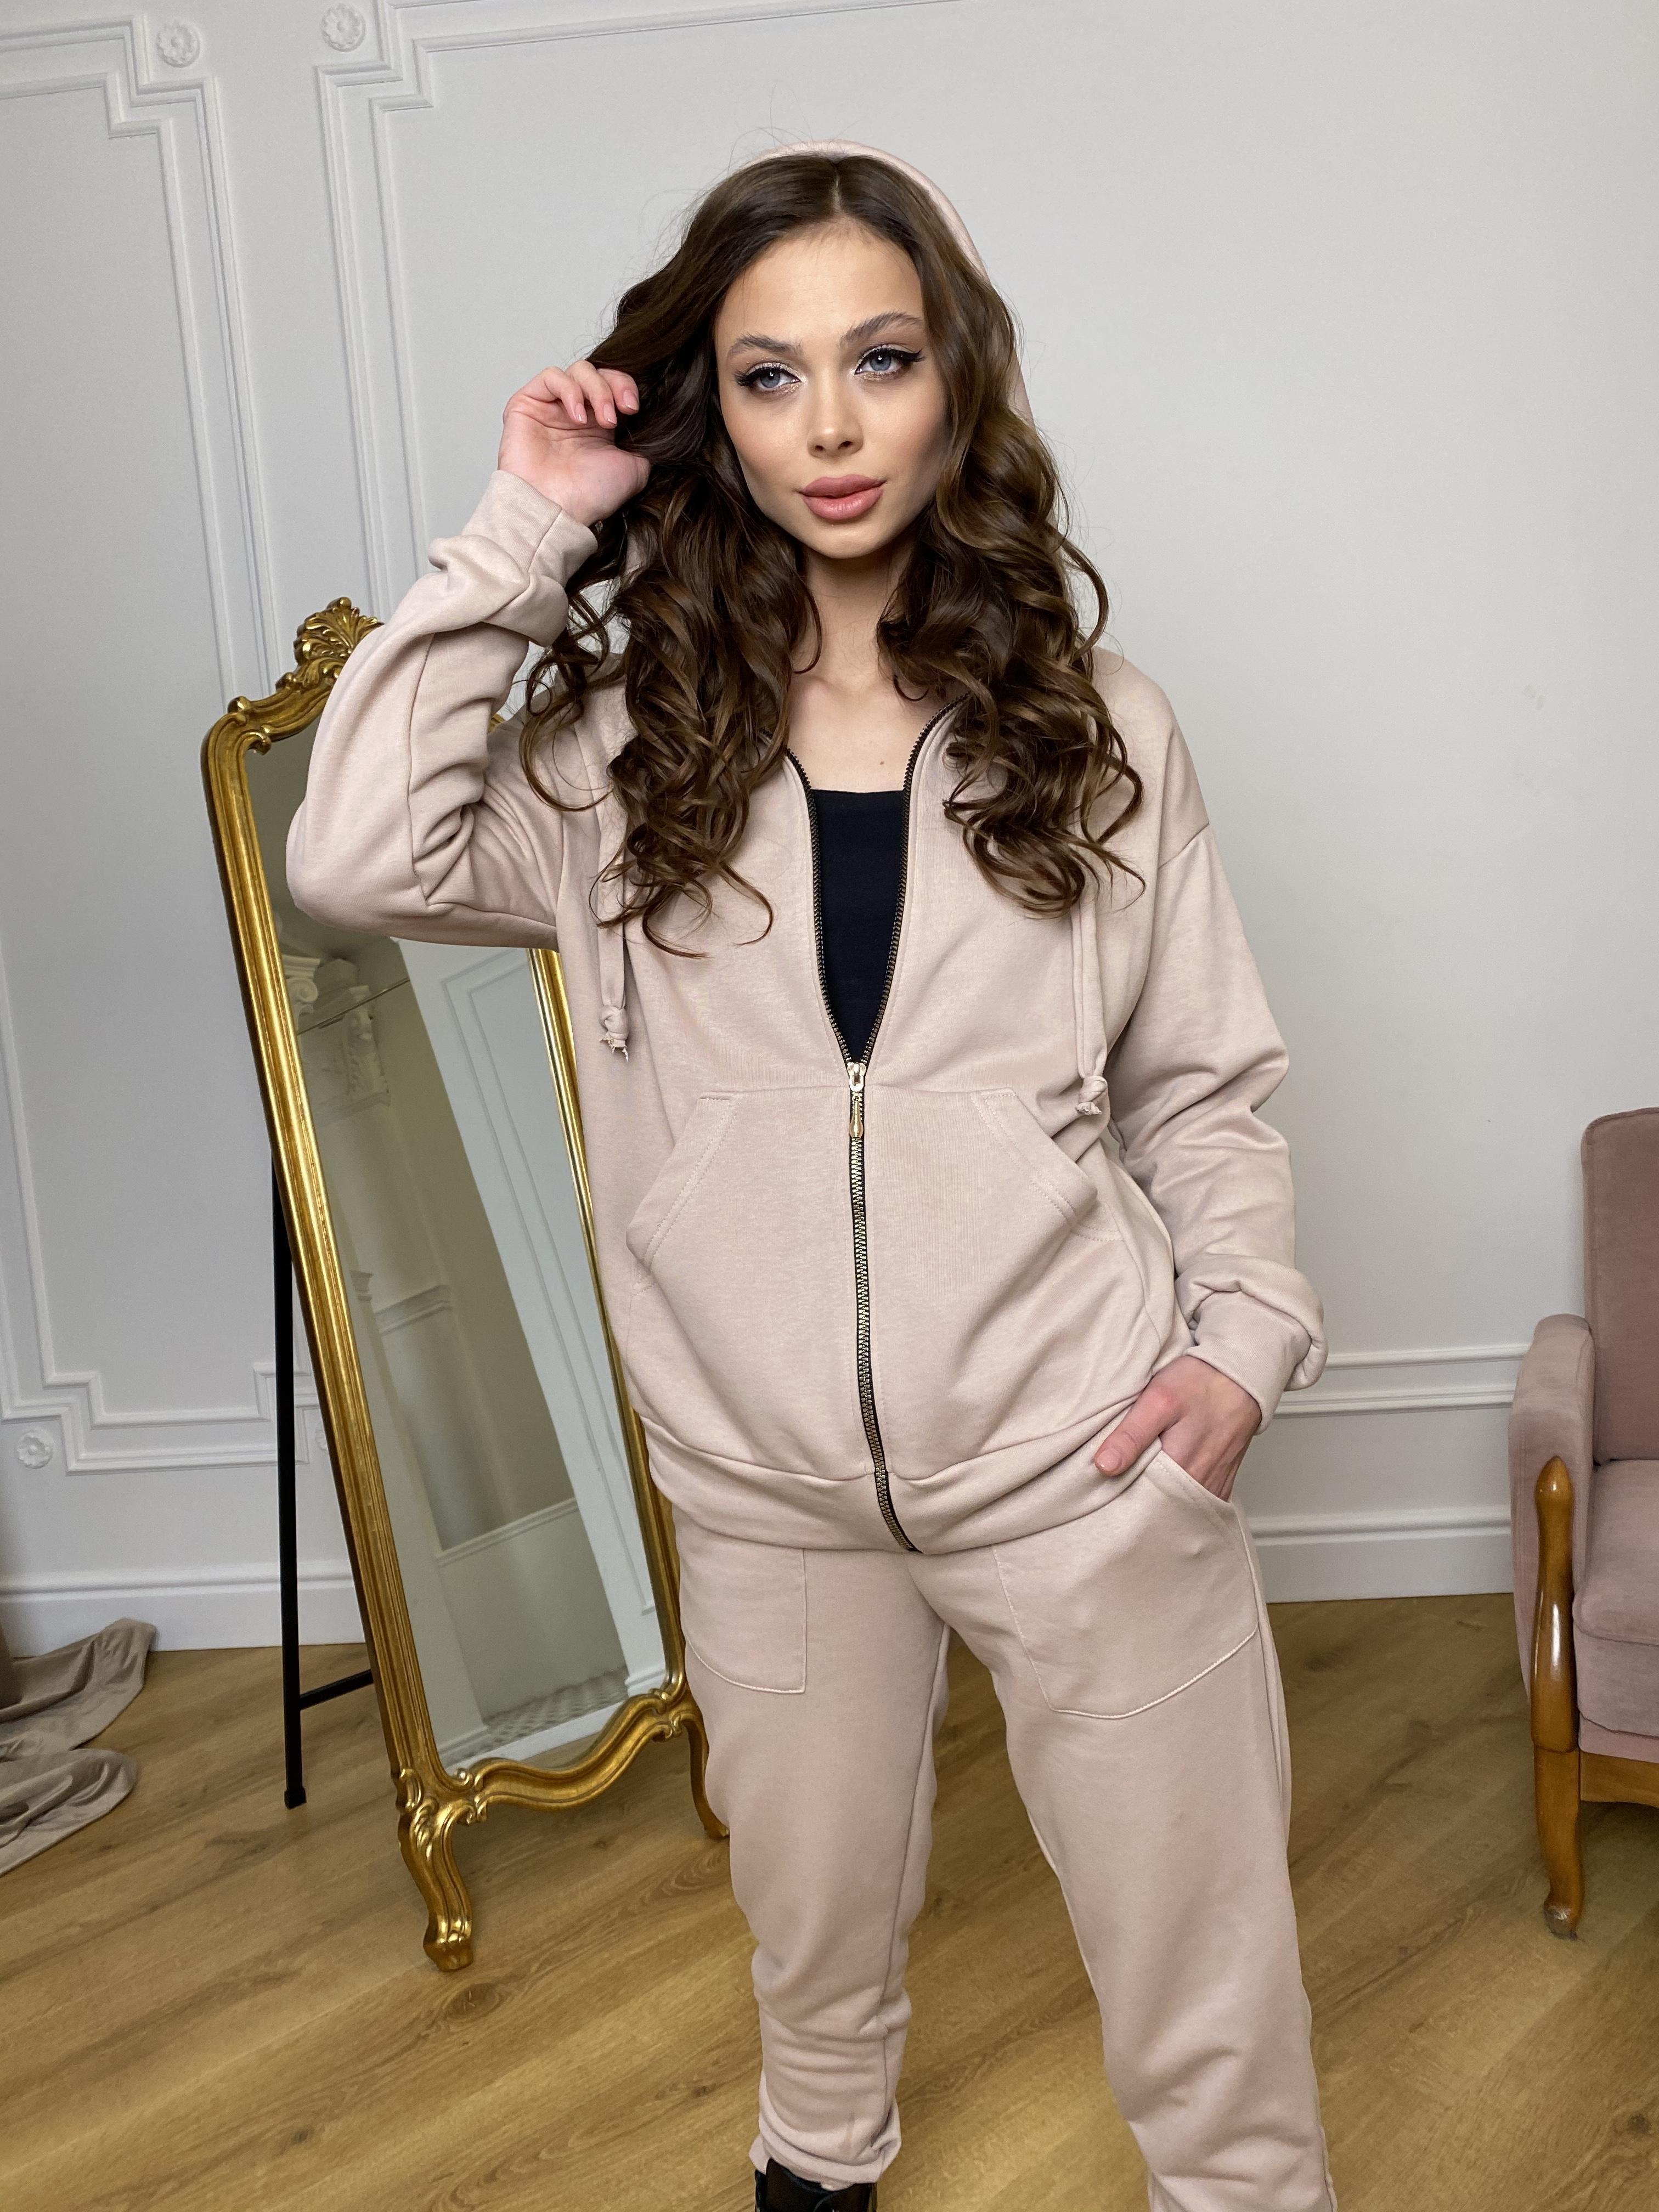 Брокер костюм  из 3х нитки  9634 АРТ. 45981 Цвет: Бежевый - фото 9, интернет магазин tm-modus.ru